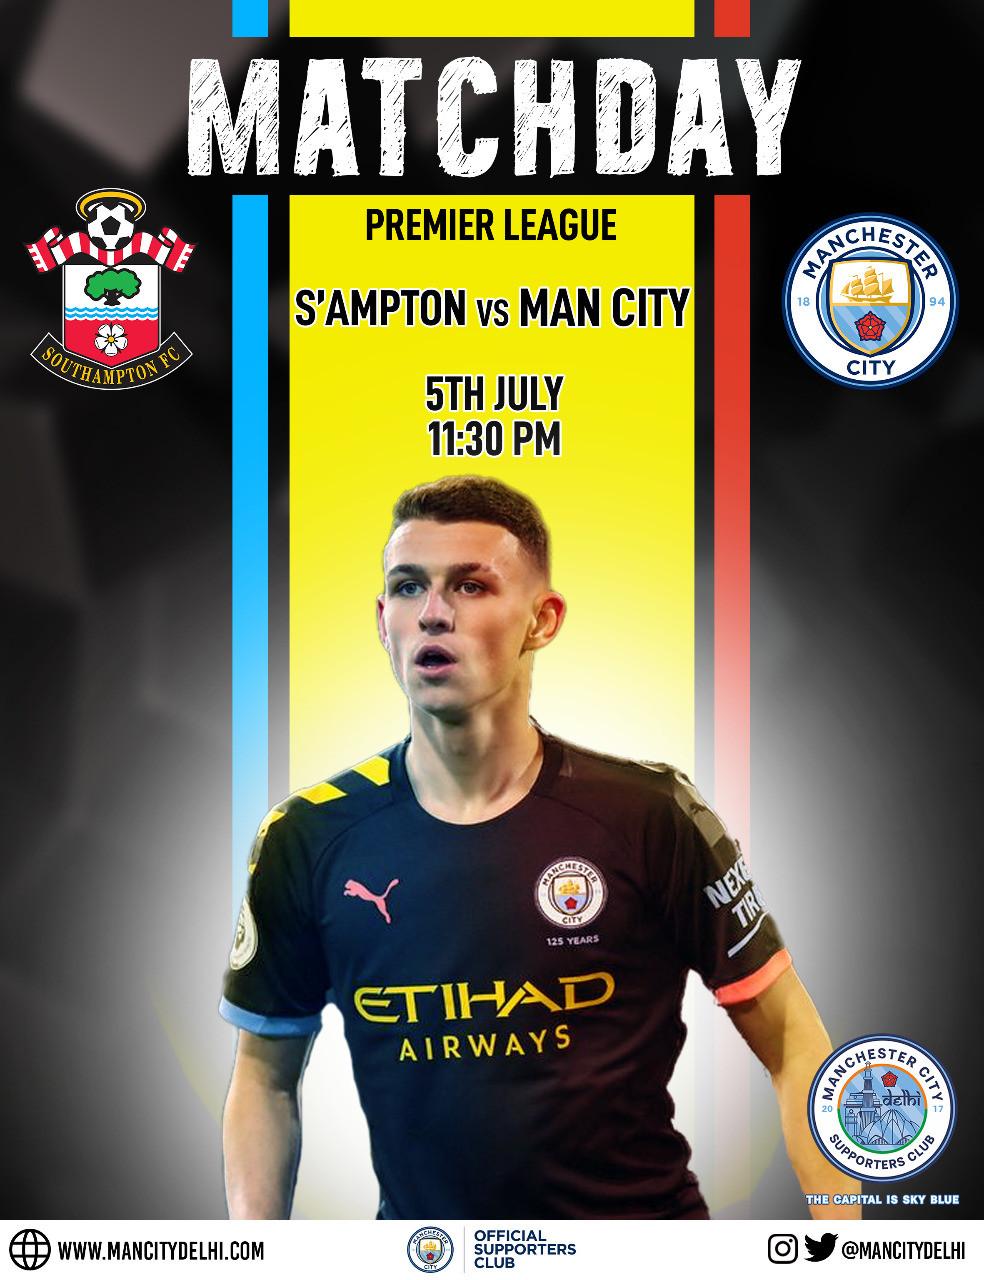 Southampton vs Manchester City Premier League match preview, team news, lineup prediction